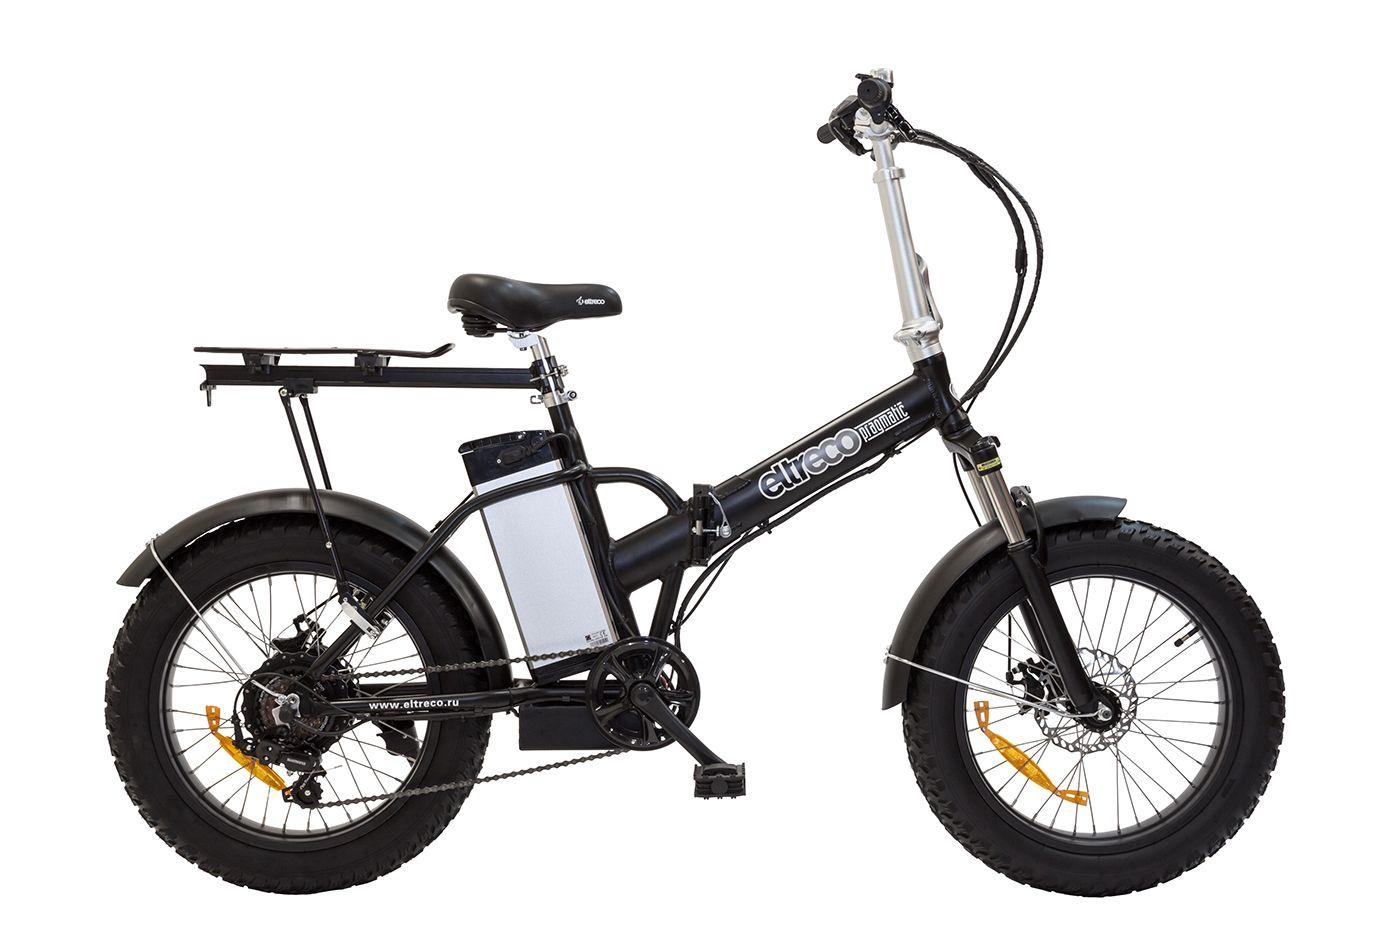 Велосипед Eltreco Pragmatic 500W 2016,  Электро  - артикул:267937